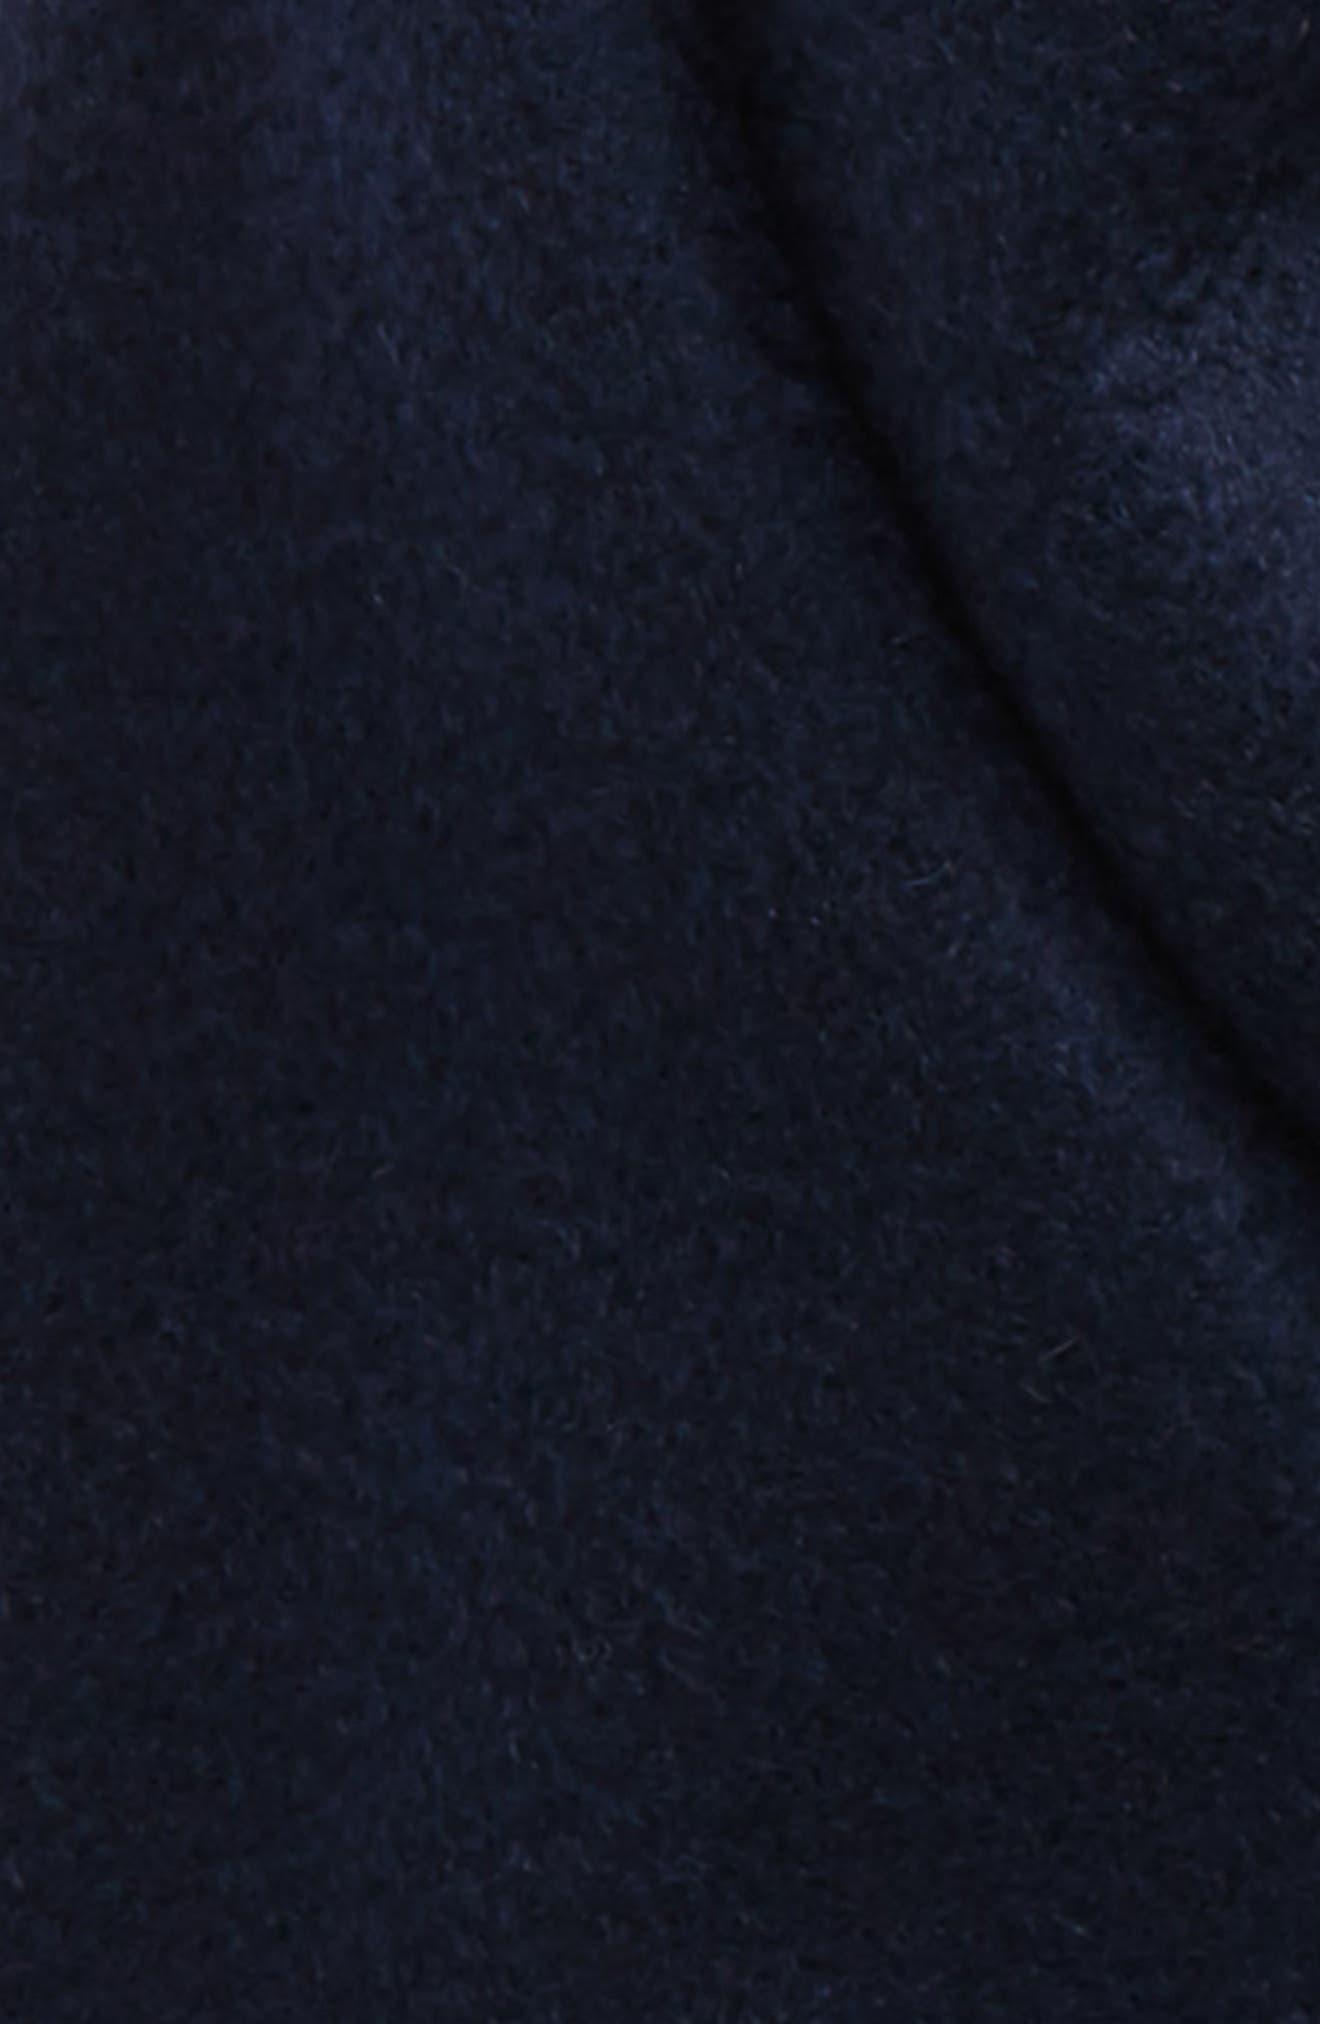 Cashmere Wrap Scarf,                             Alternate thumbnail 3, color,                             Ultramarine